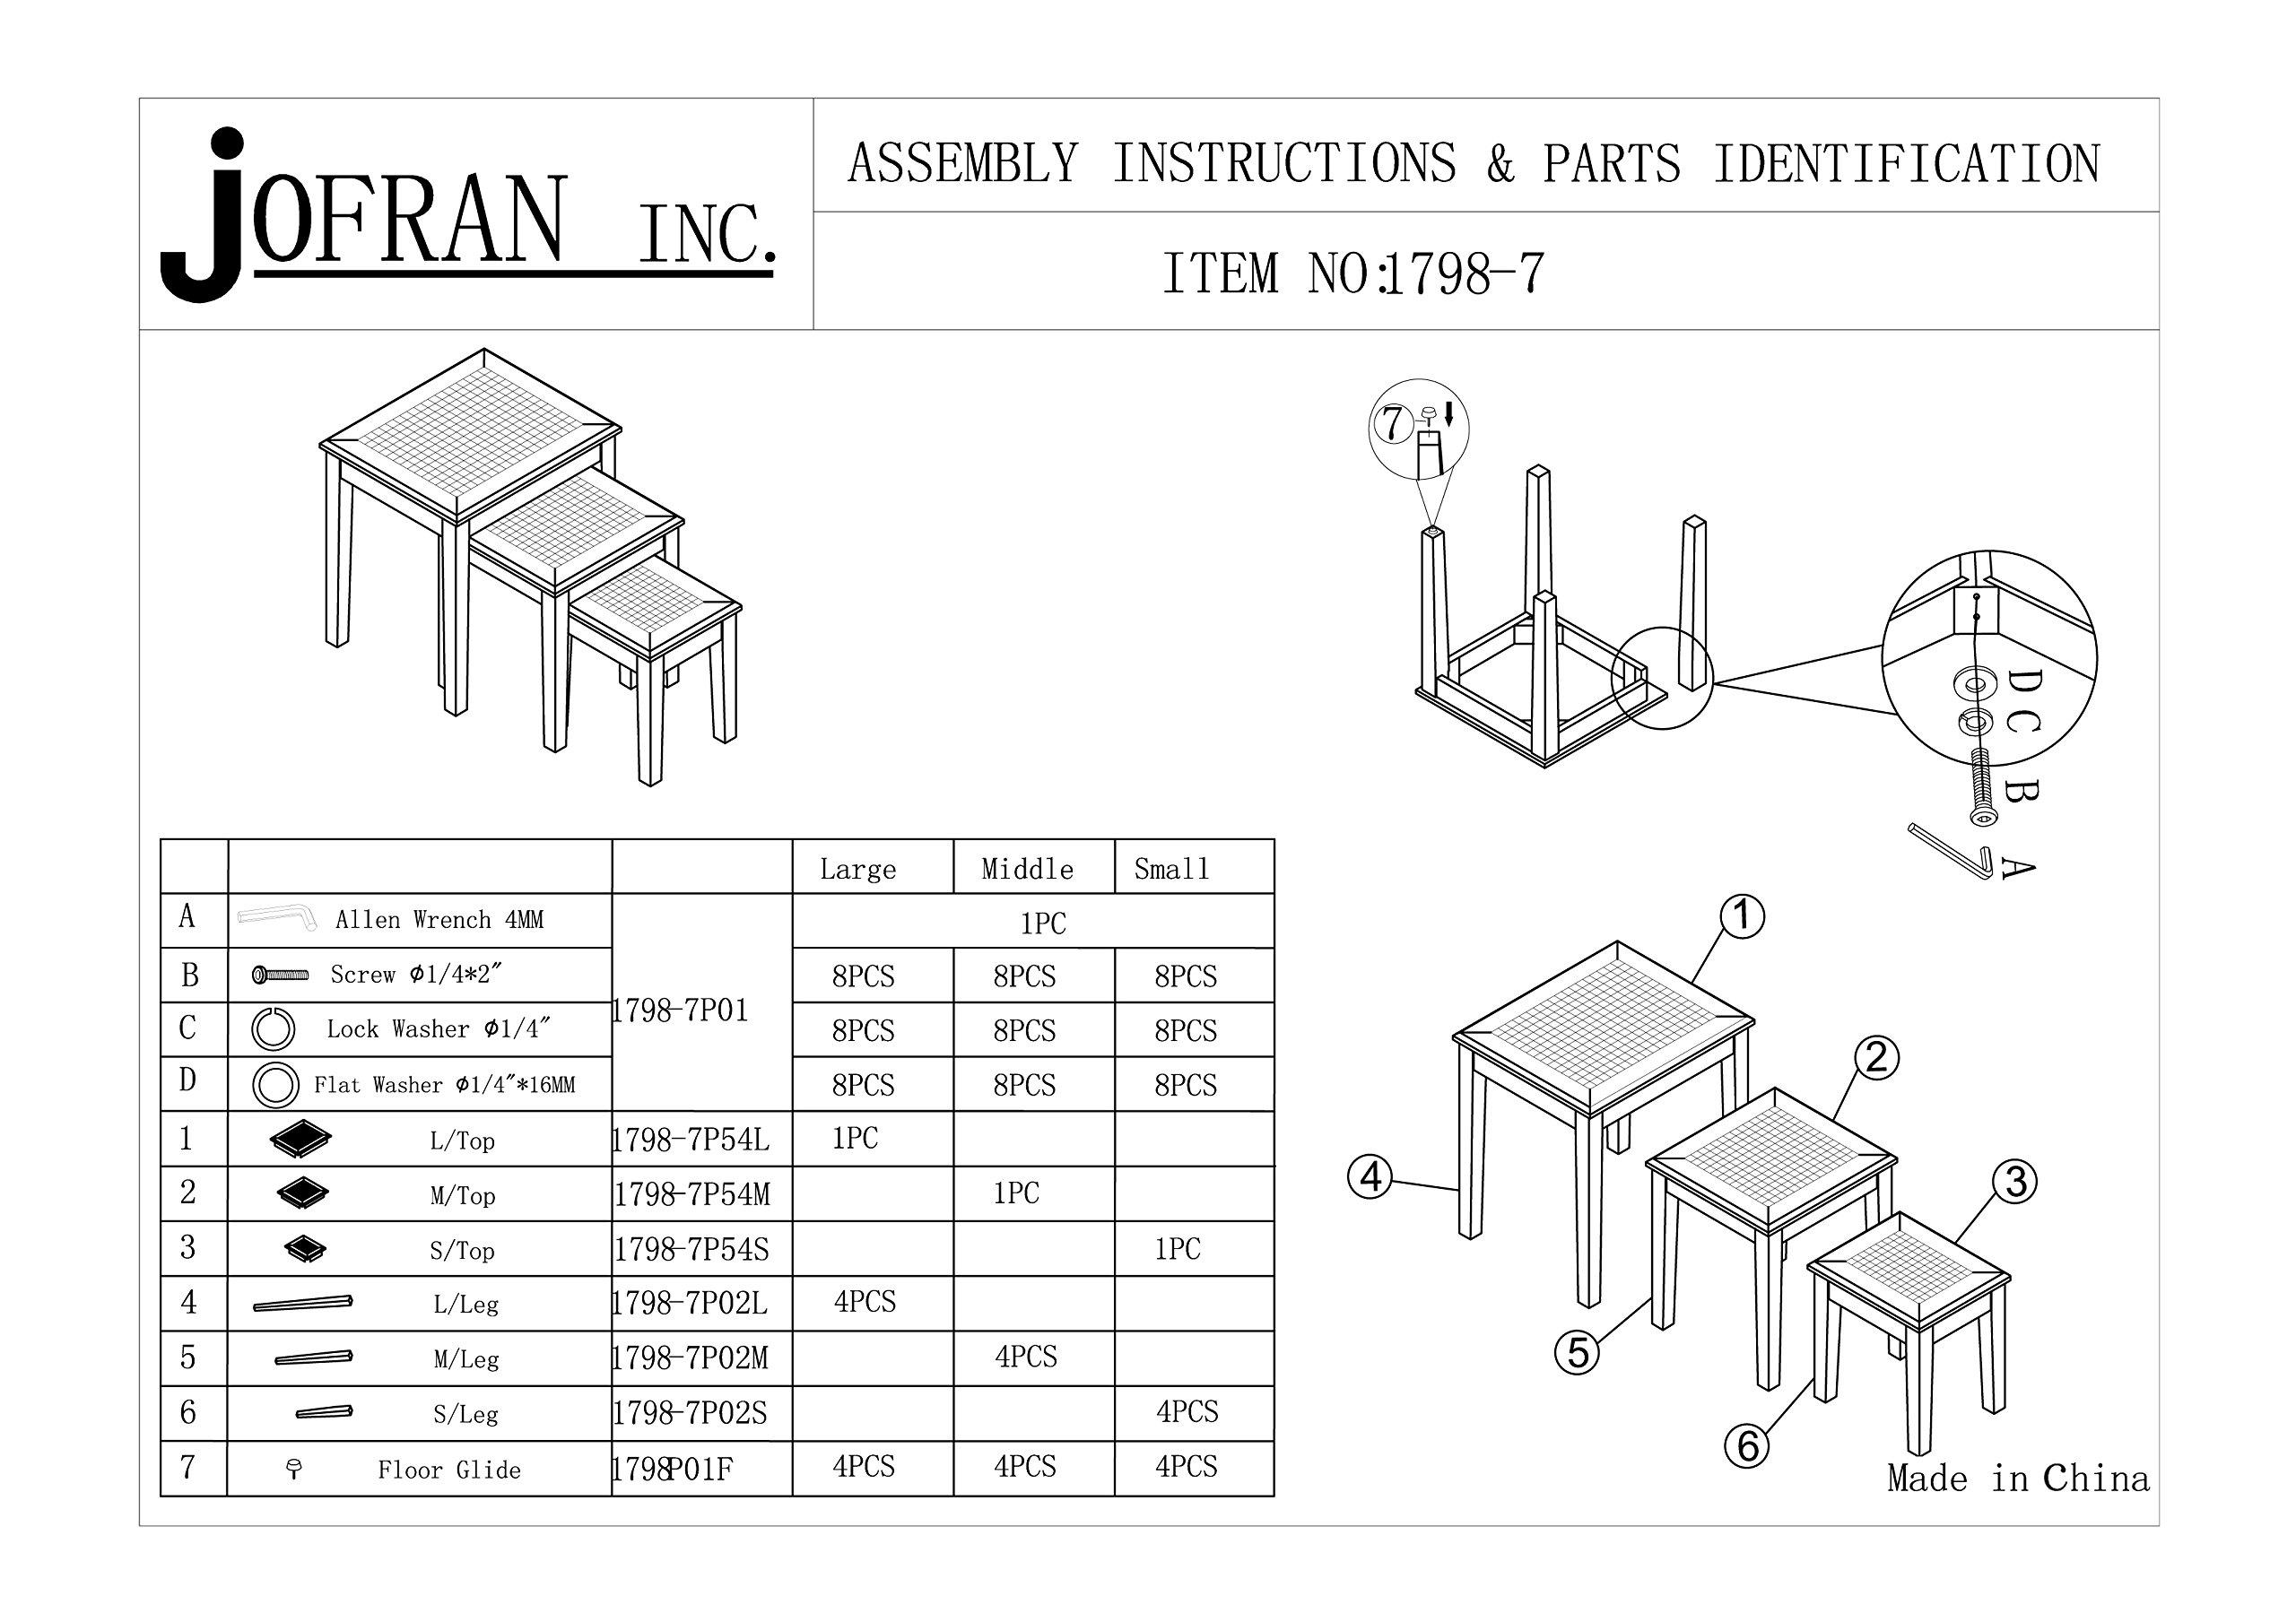 Jofran Grey Mosaic Nesting Tables, Large 21'' WX 17'' D X 22'' H, Medium 16.25'' W X 15.25'' D X 19'' H, Small 12'' W X 14'' D X 15'' H, Dark Finish, (Set of 3) by Jofran